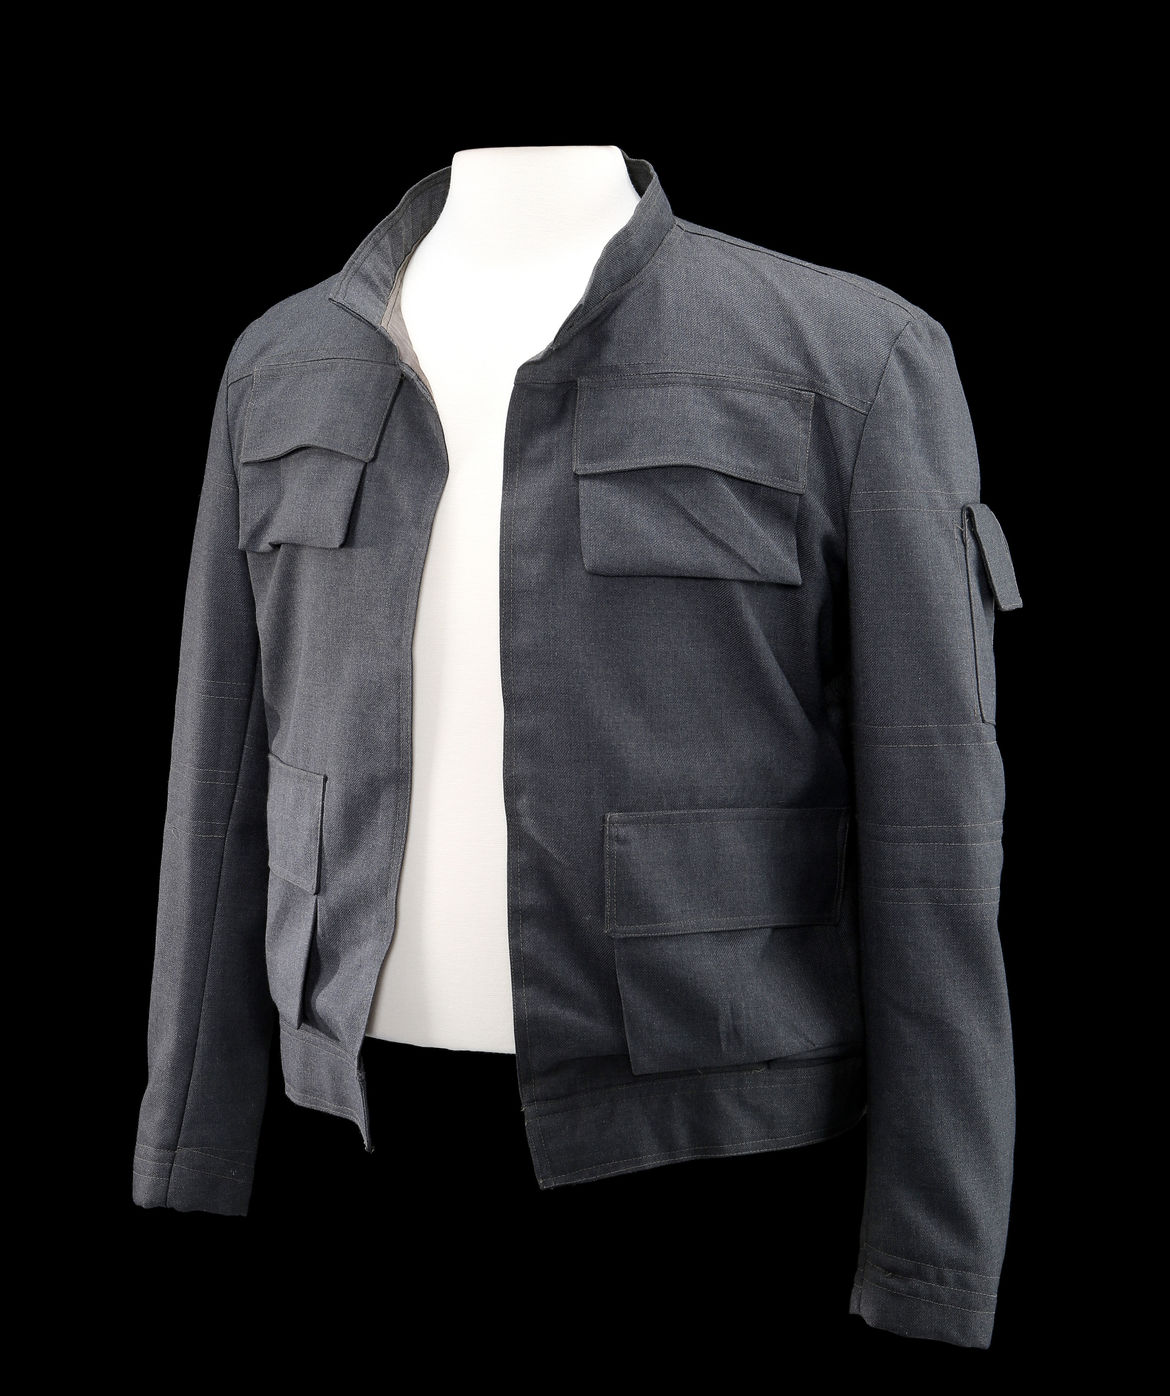 92116_Han Solo Harrison Ford Jacket_6